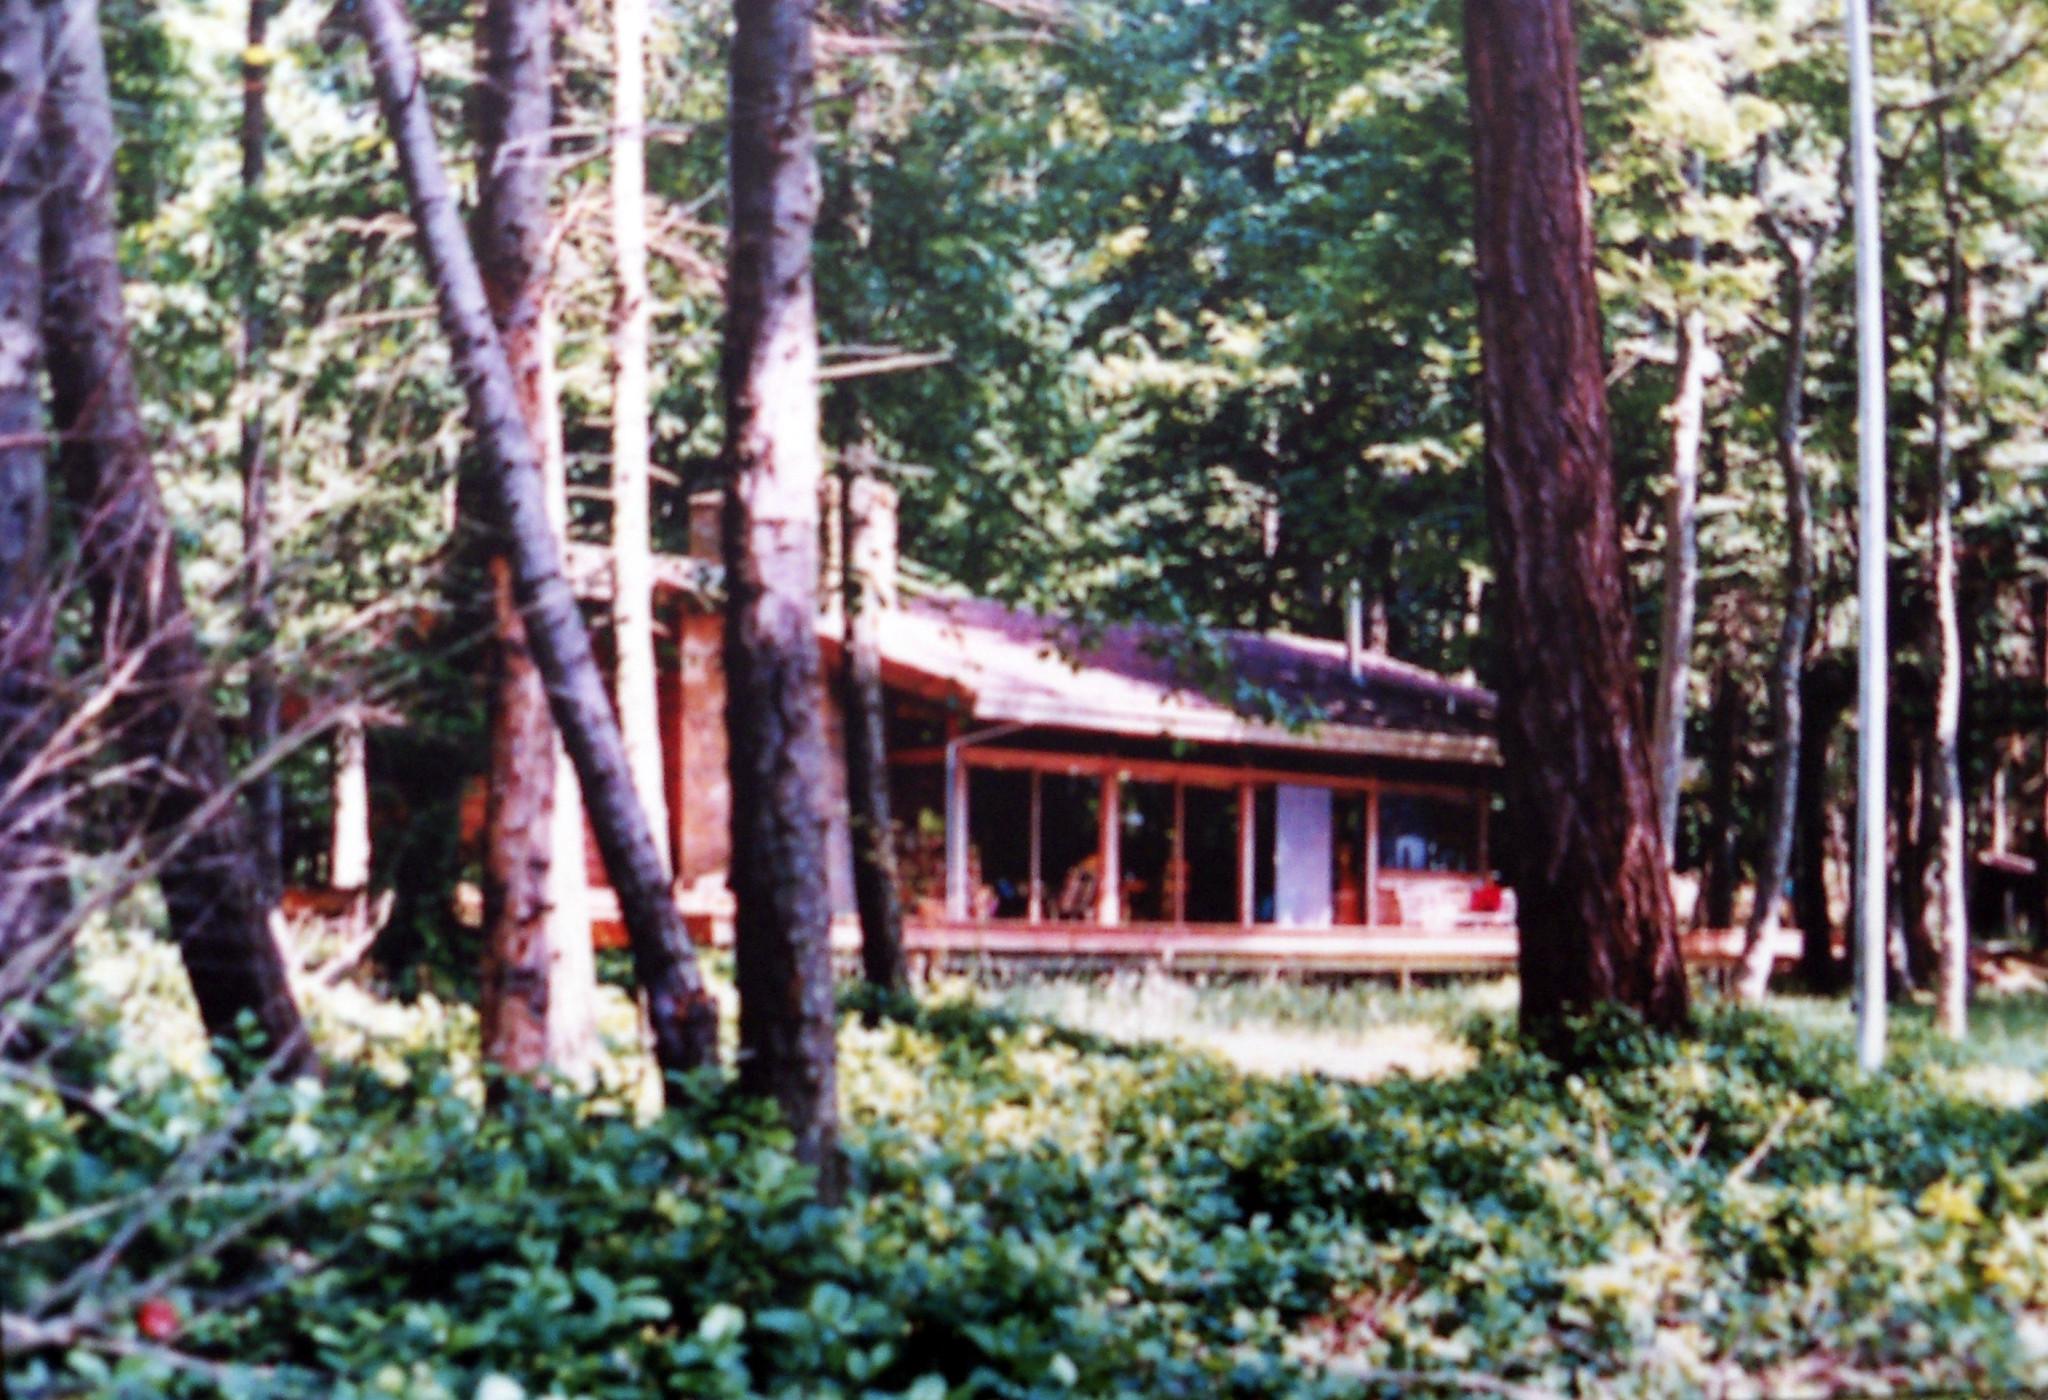 Cabin Decourcy Inland Photo